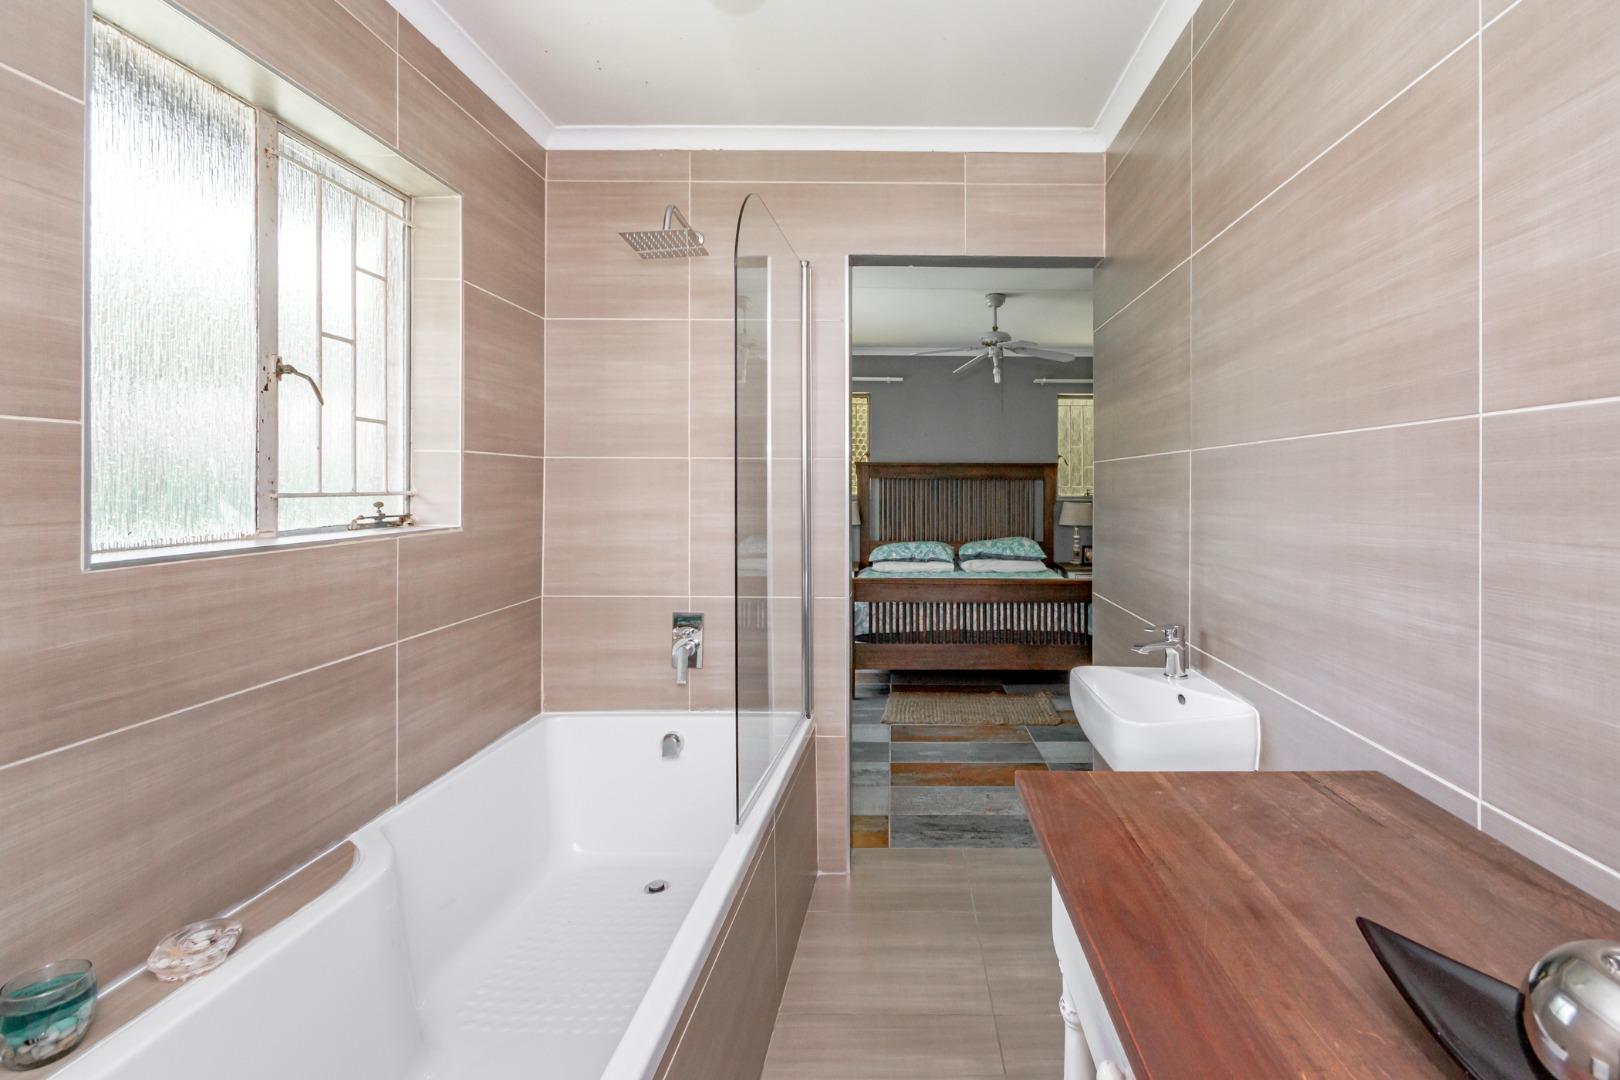 4 Bedroom House For Sale in Albertsdal